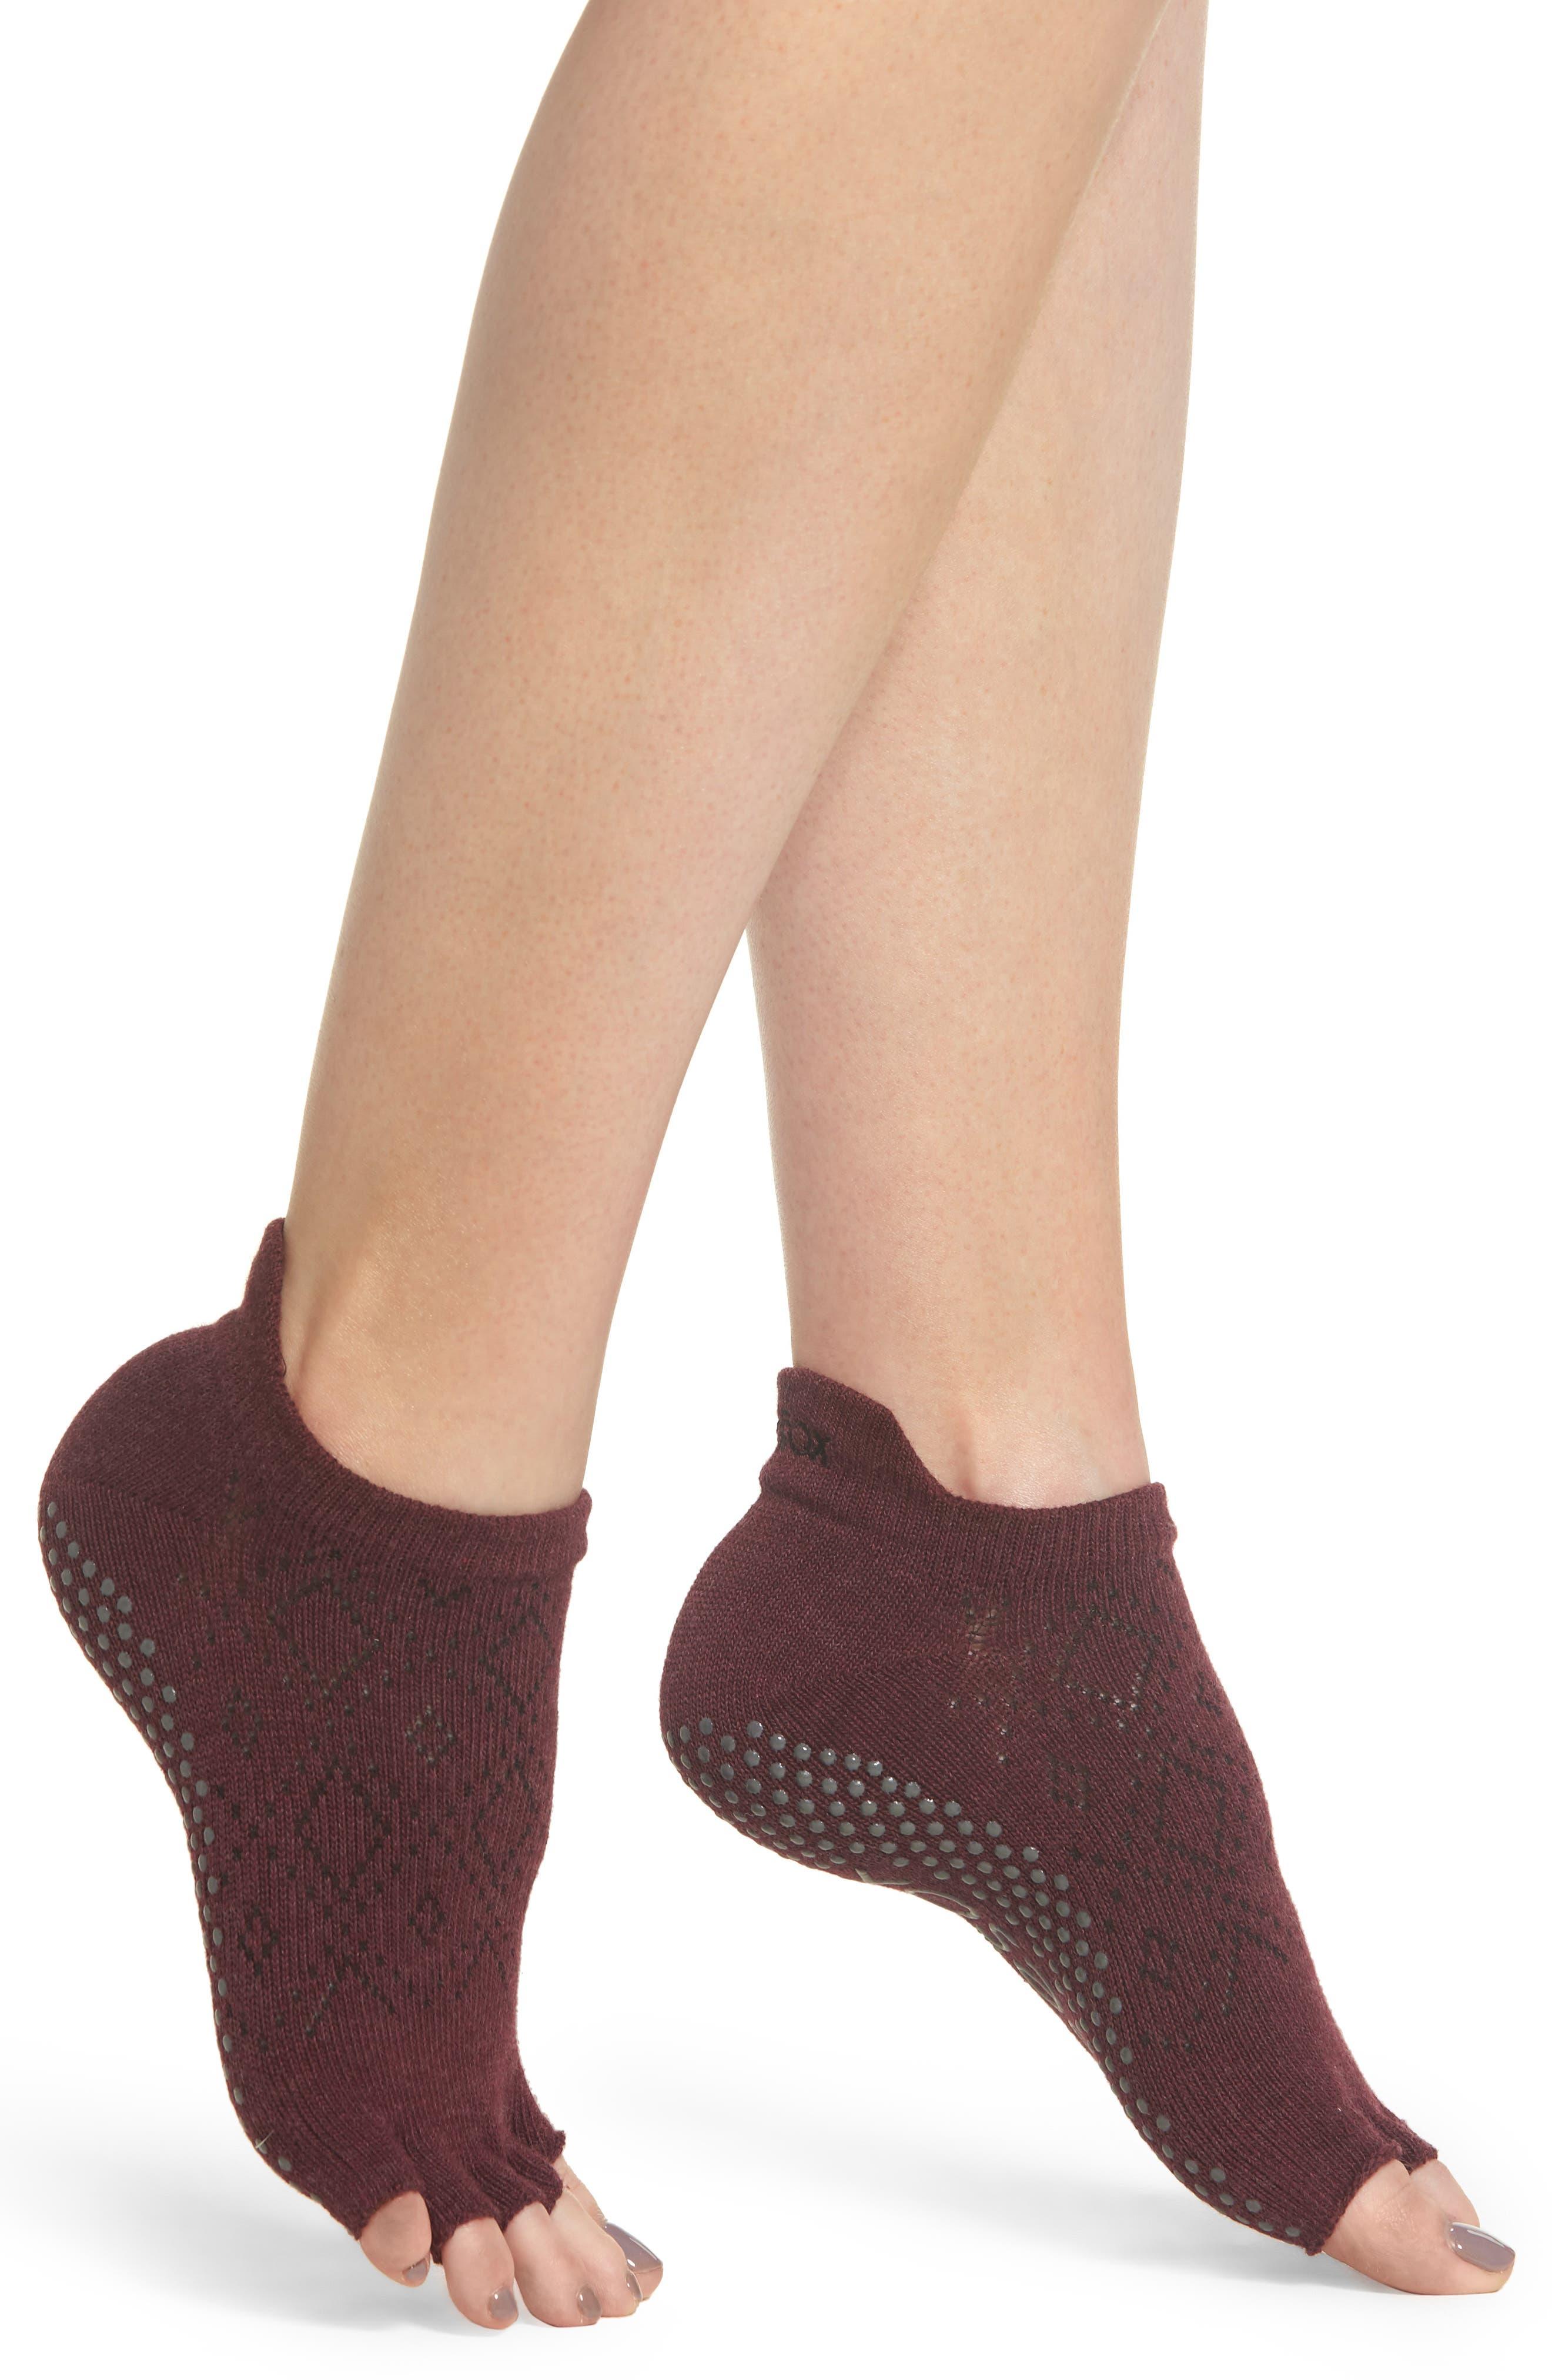 Low Rise Half-Toe Gripper Socks,                             Main thumbnail 1, color,                             VIXEN